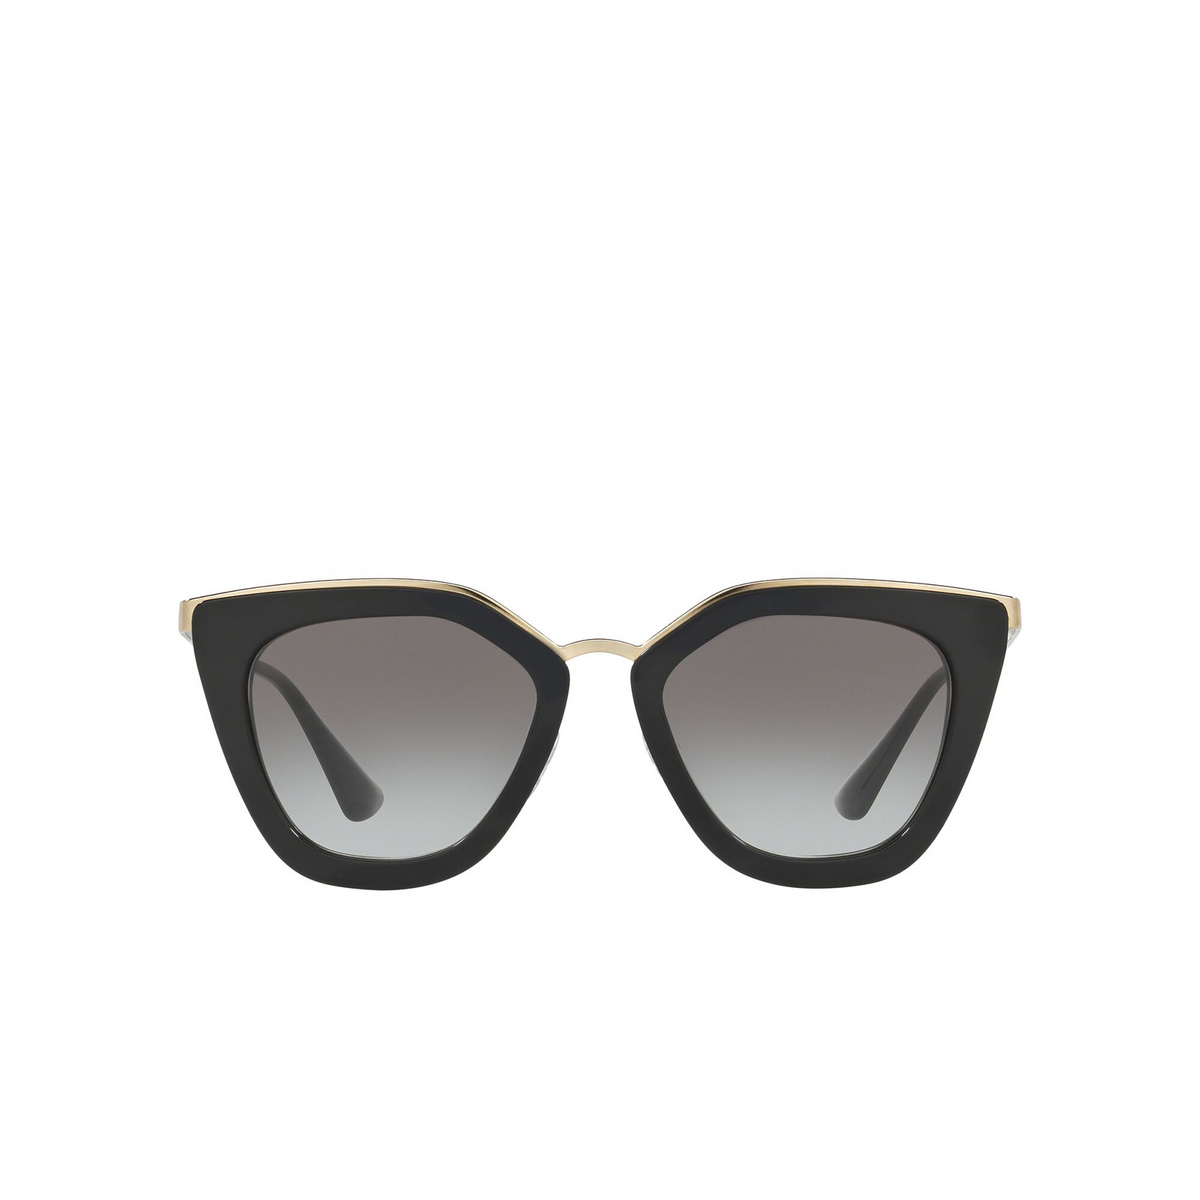 Prada® Cat-eye Sunglasses: PR 53SS color Black 1AB0A7 - front view.